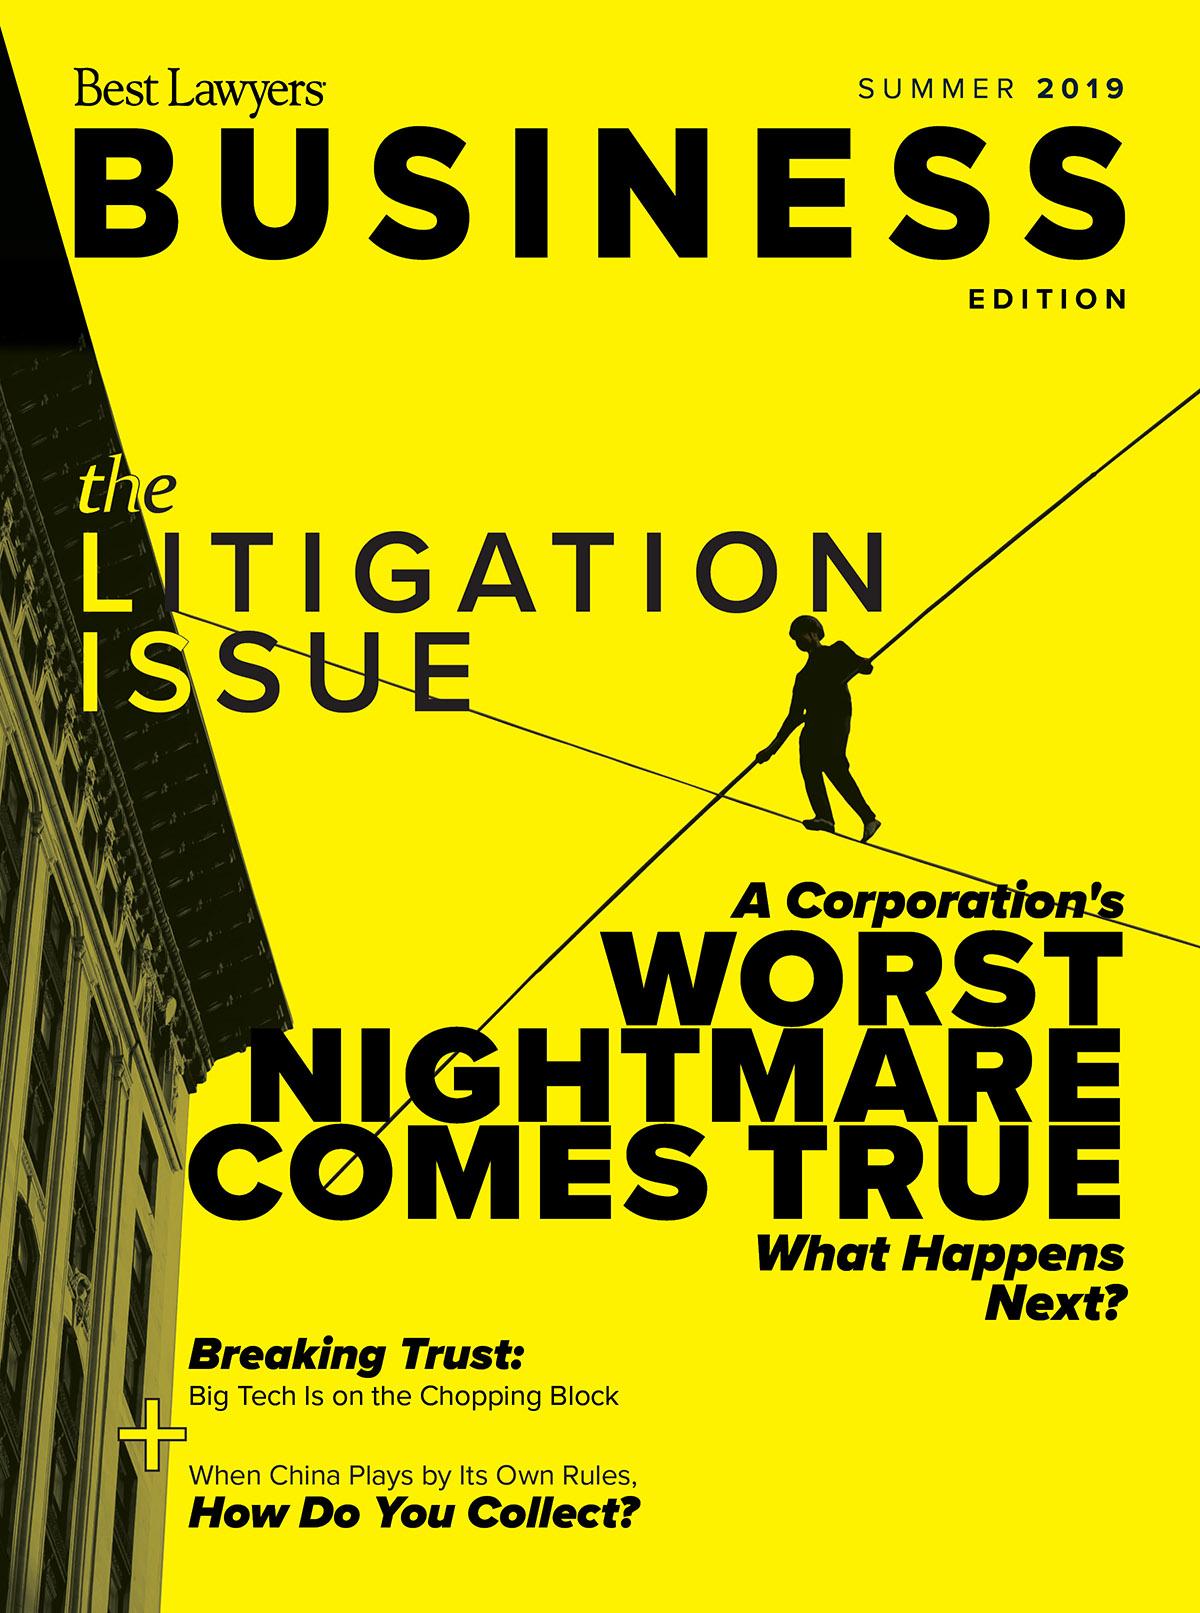 Summer Business Edition